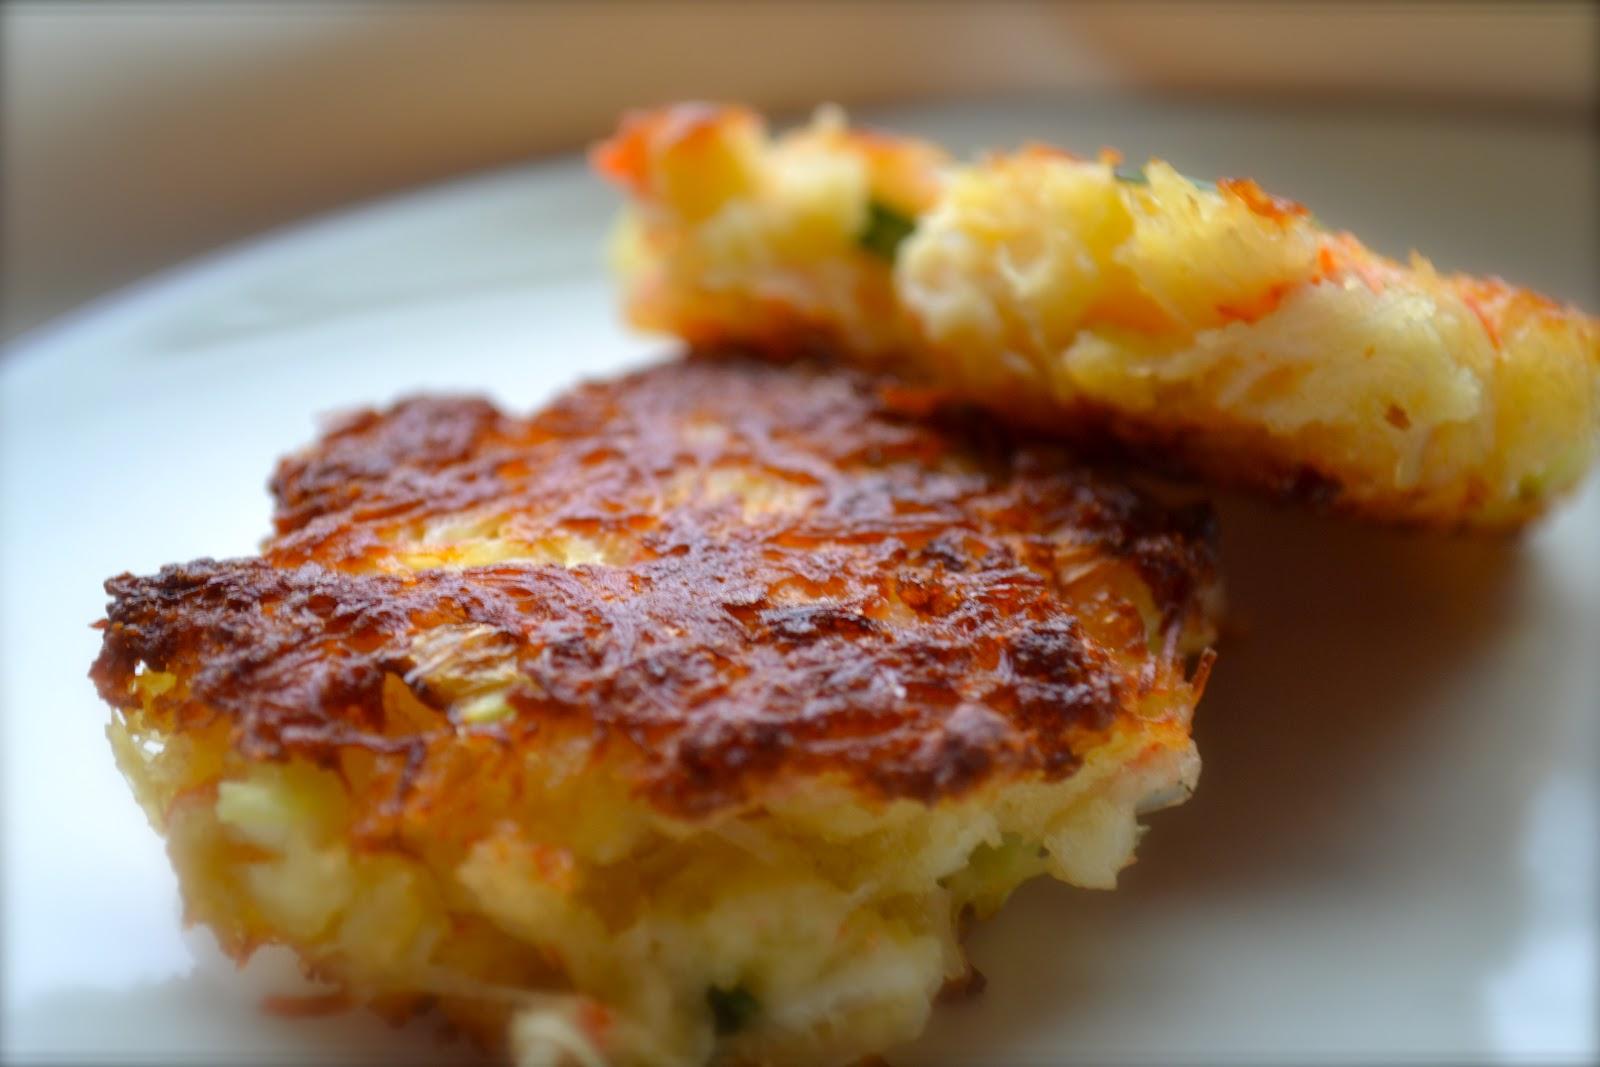 Best Maryland Crab Cake Recipe Ever